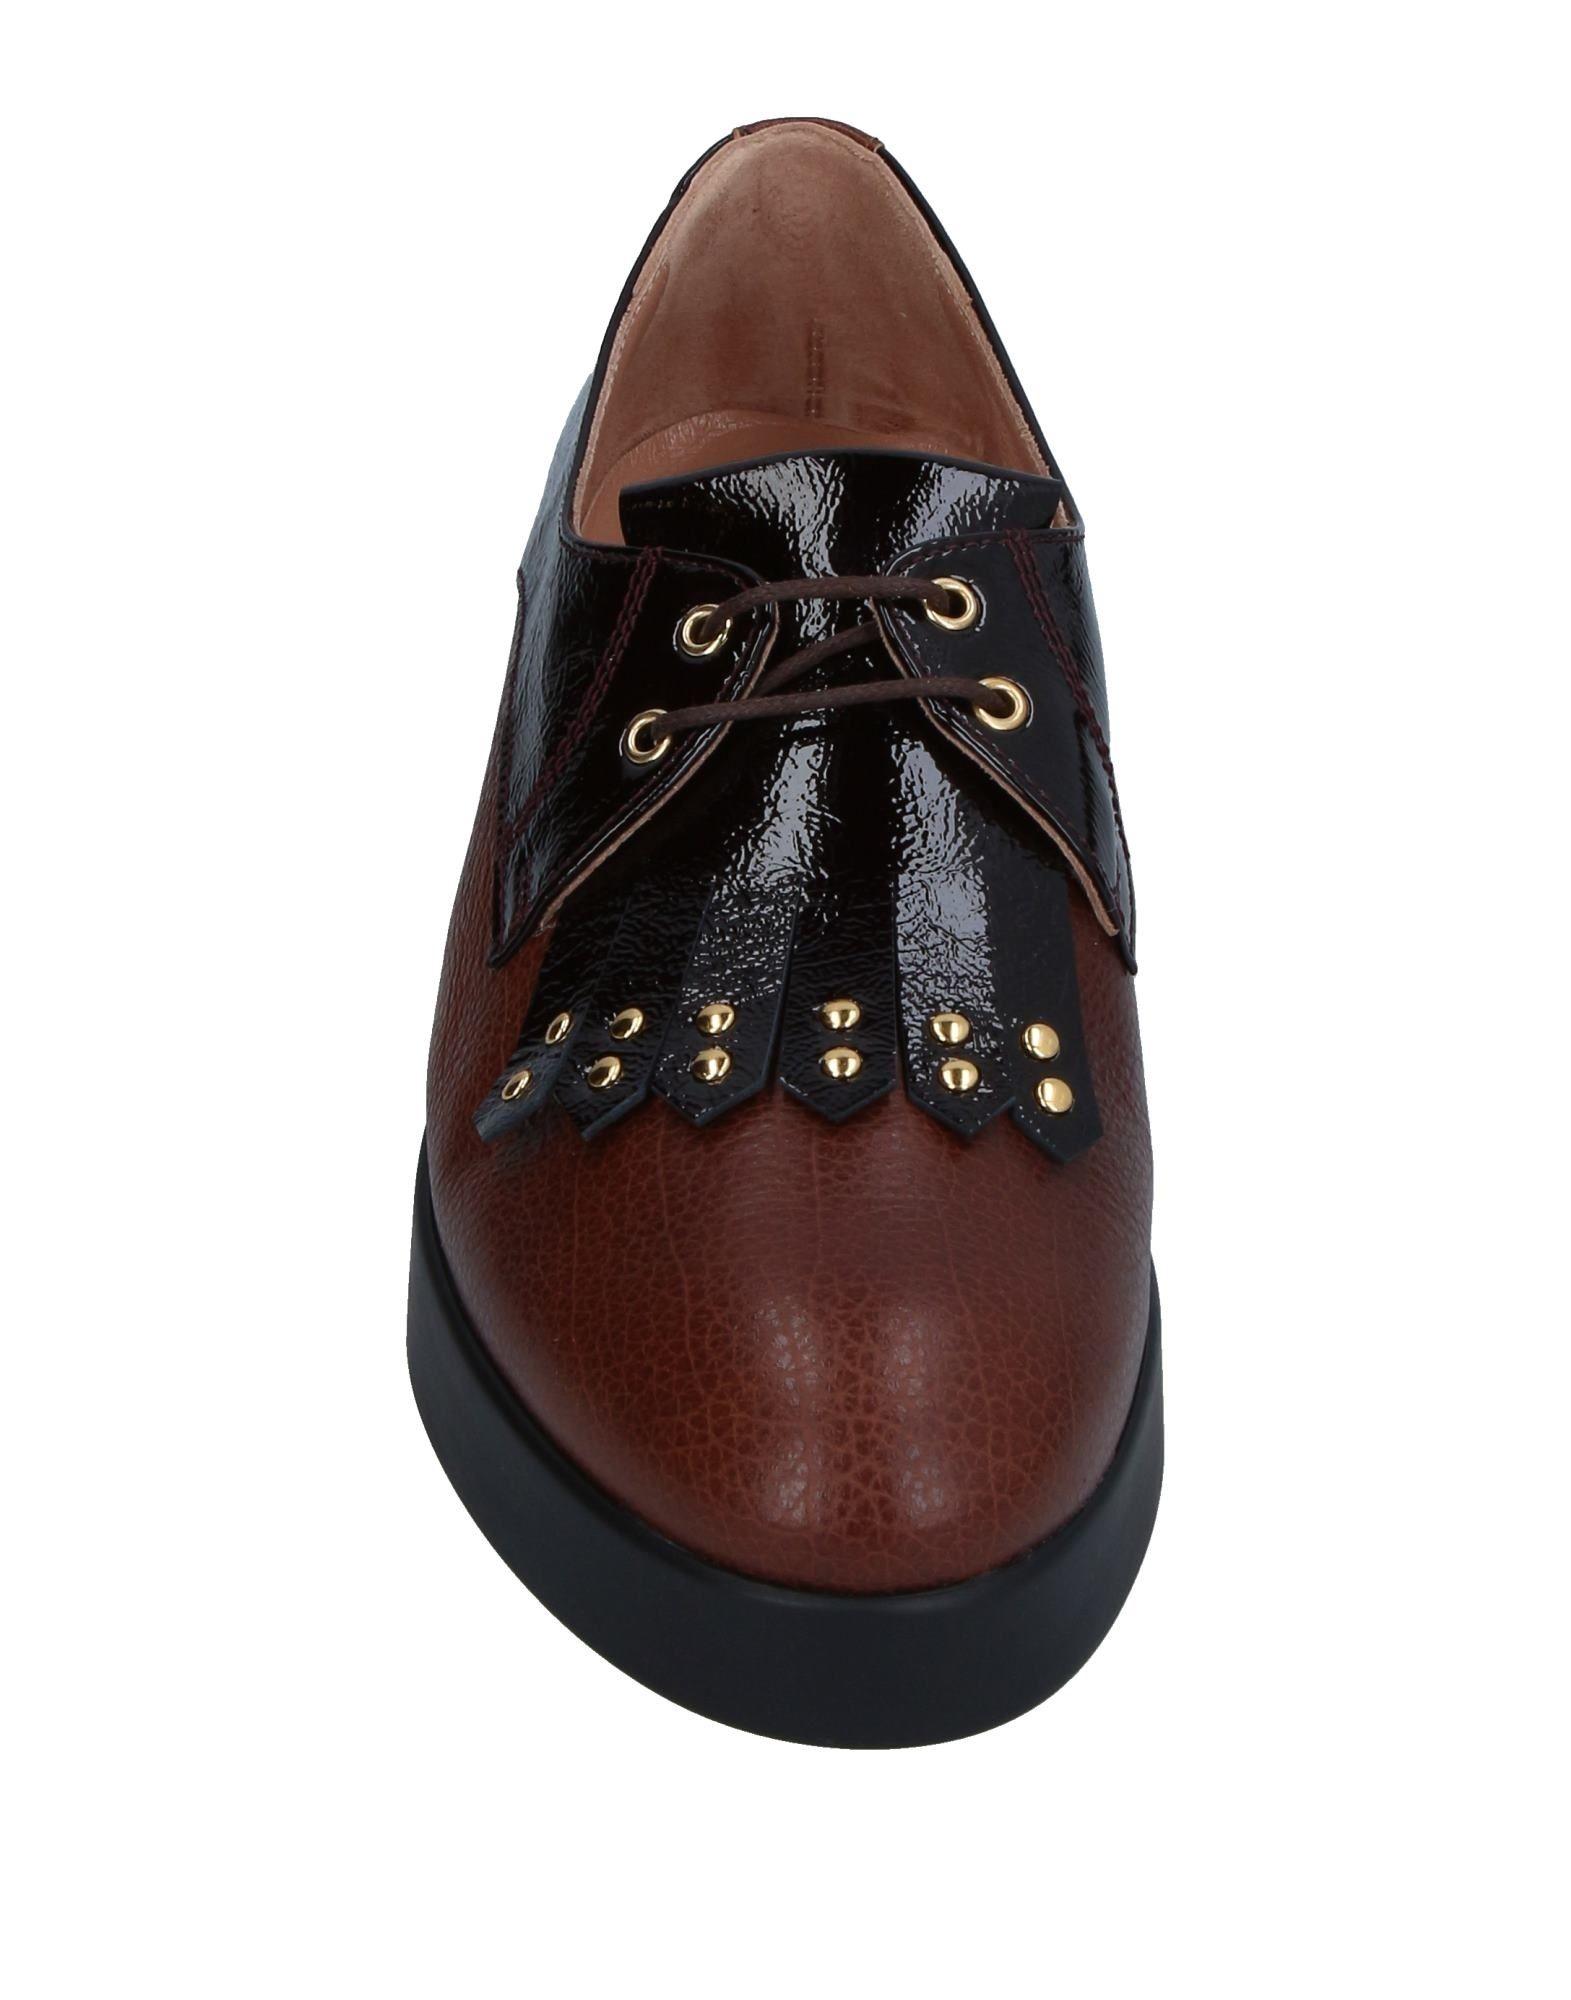 Chaussures - Tribunaux Fiorangelo MsSOfsH